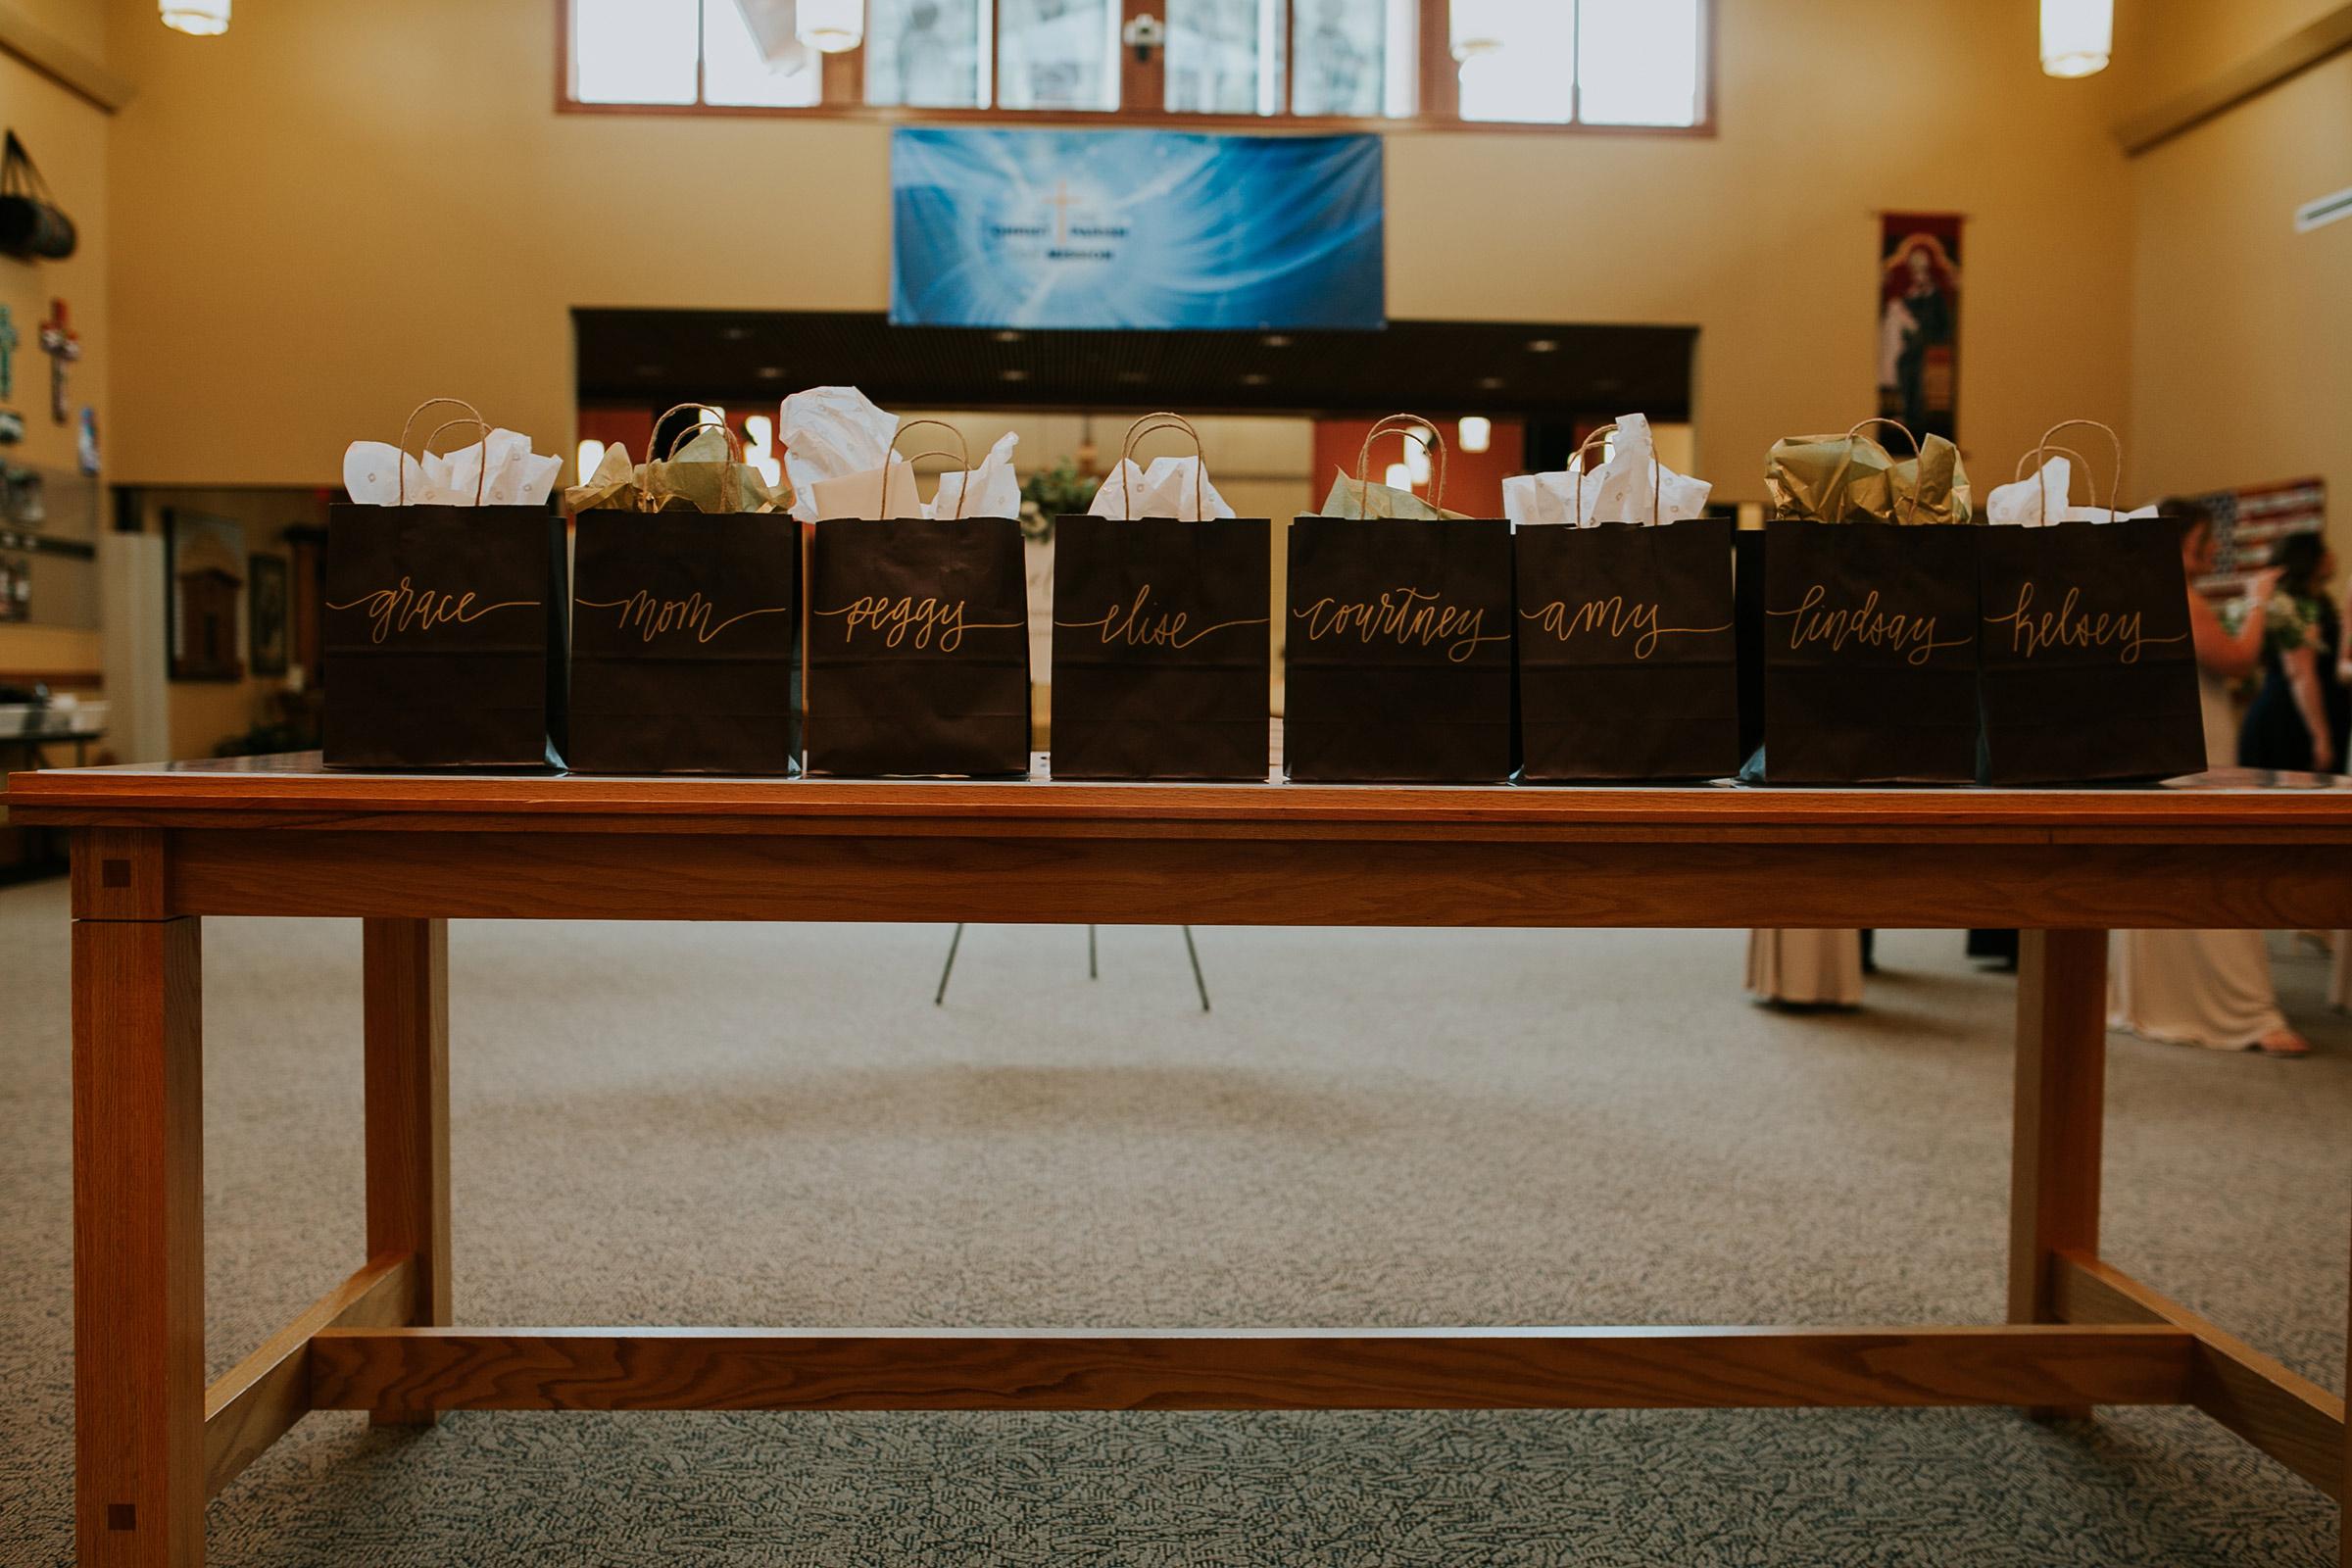 mr-mrs-hull-bride-giftbags-for-bridesmaids-st-boniface-church-waukee-desmoines-iowa-raelyn-ramey-photography-187.jpg